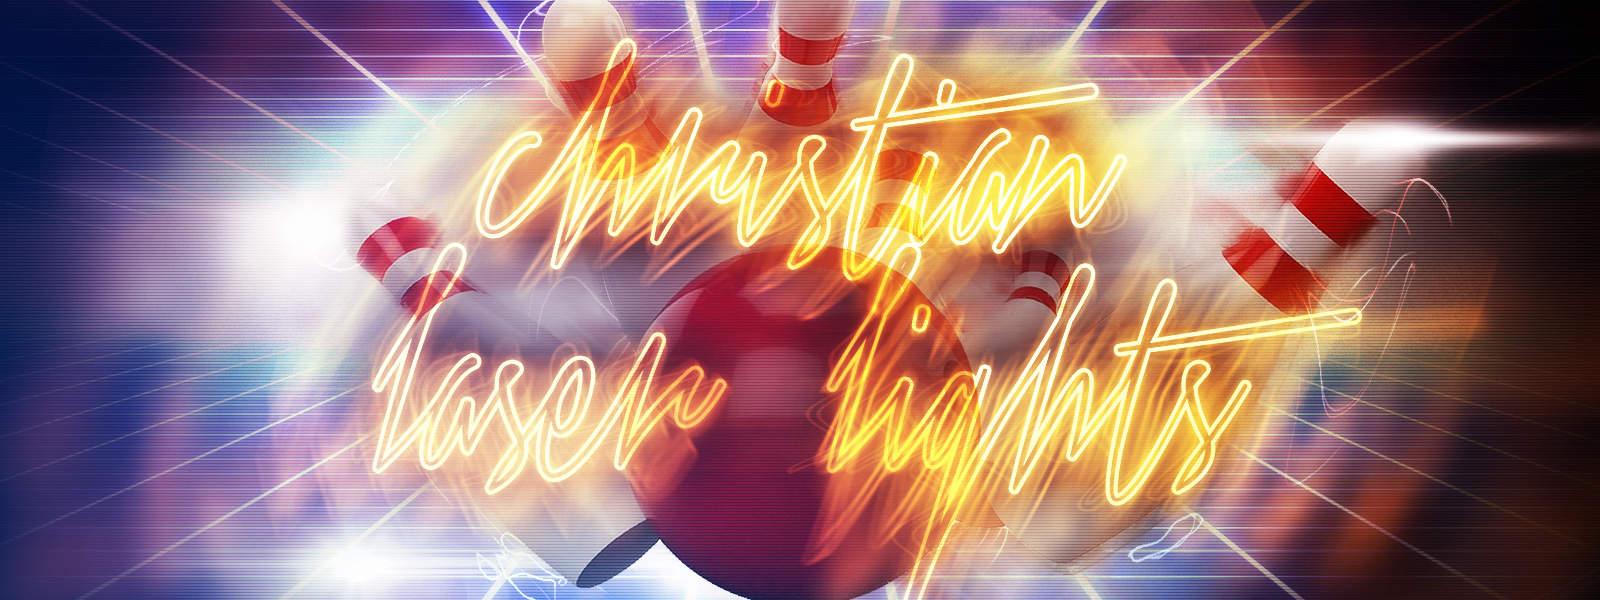 Christian Laser Lights